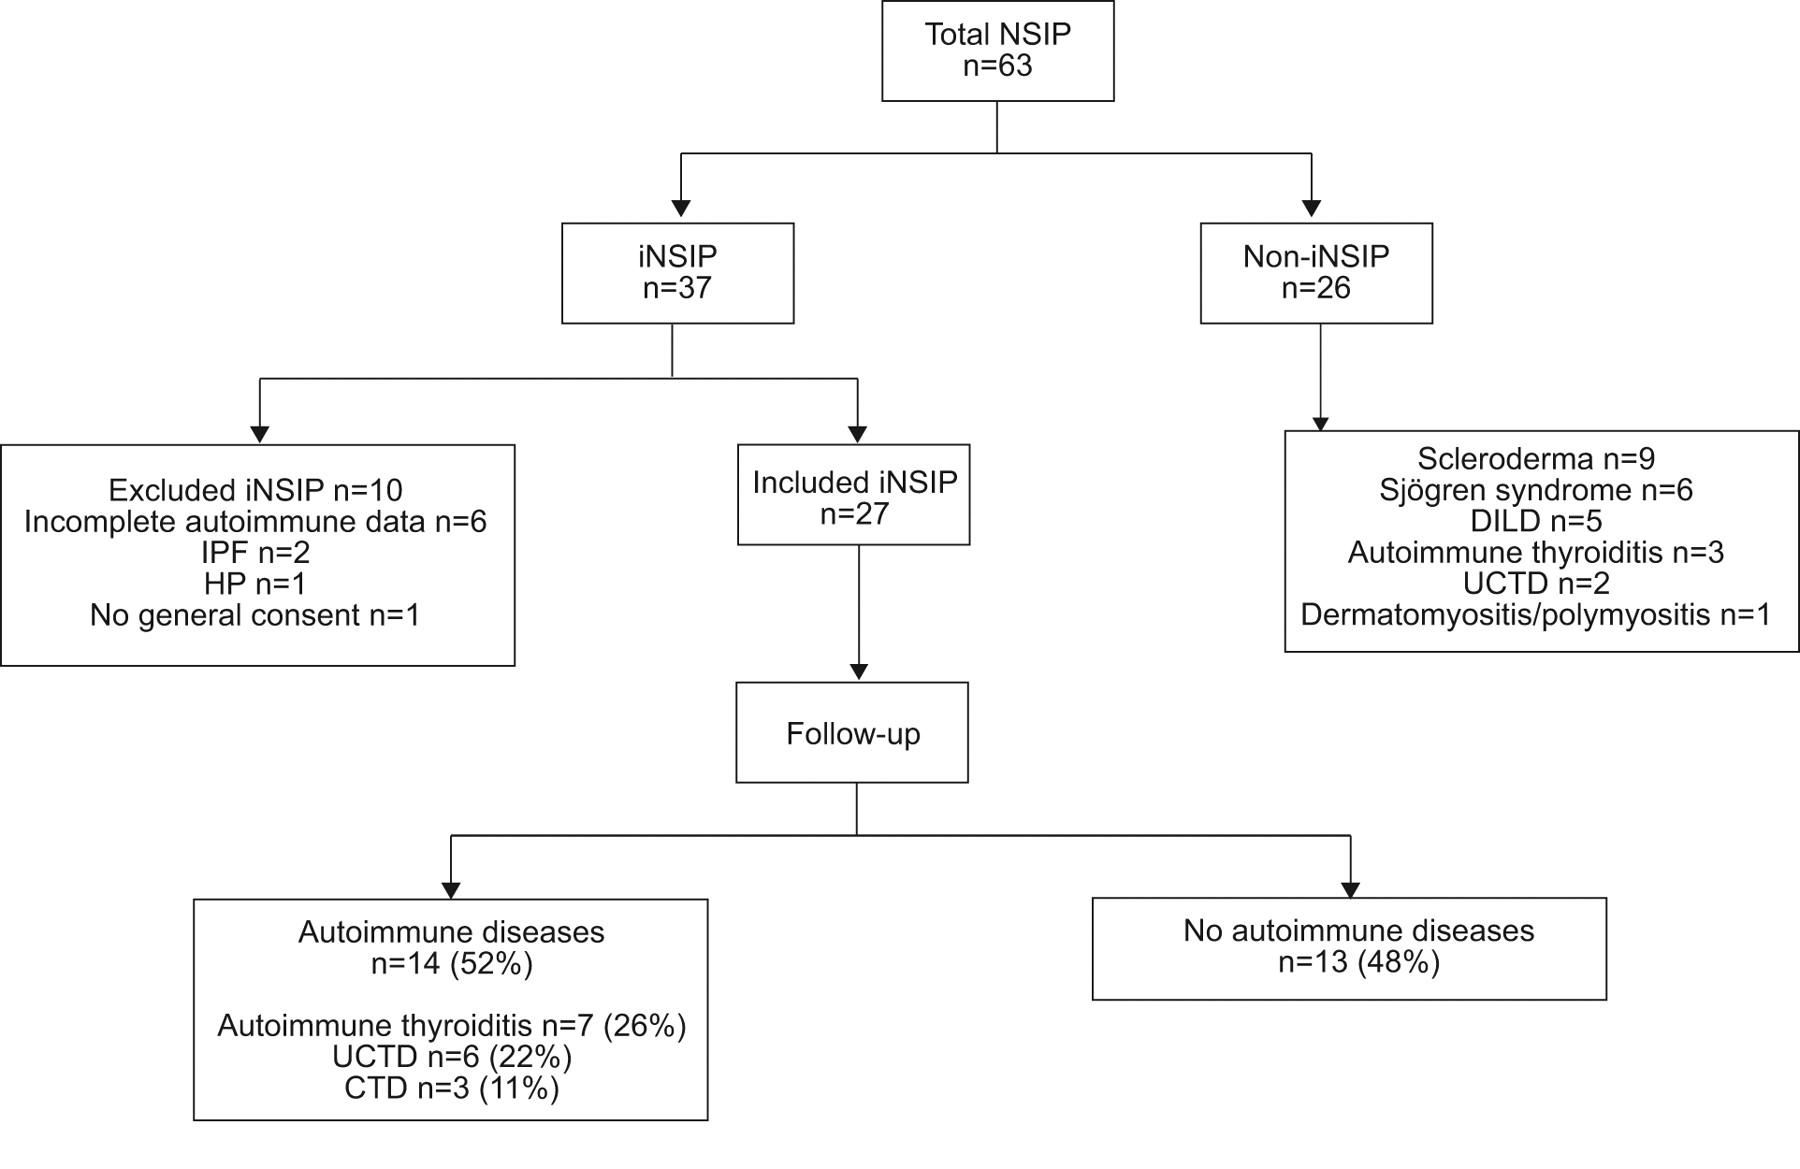 Idiopathic Nonspecific Interstitial Pneumonia An